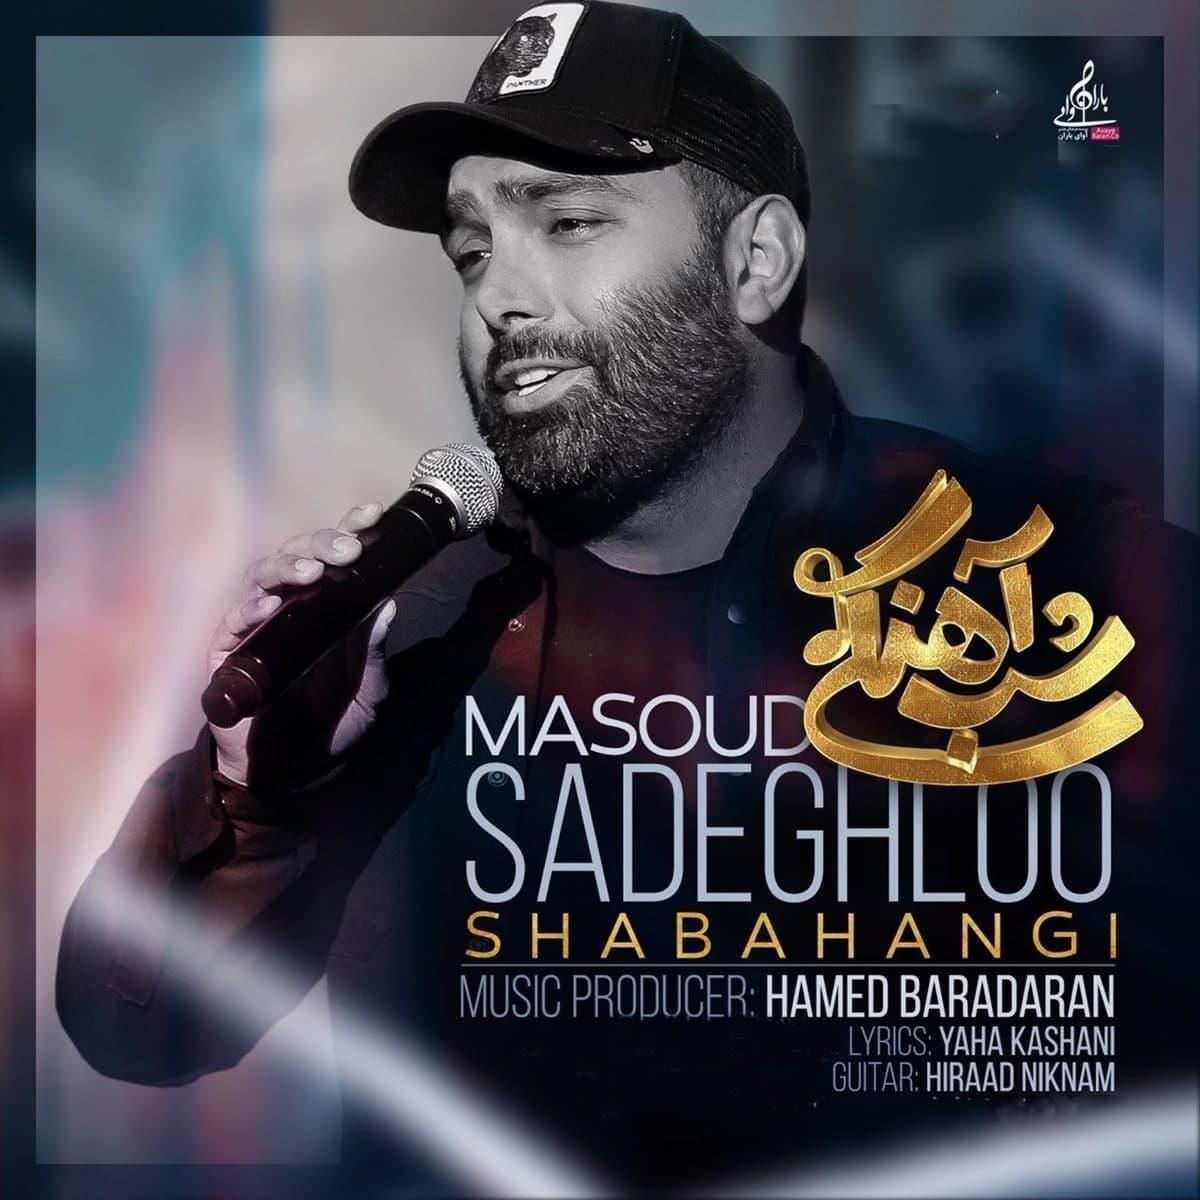 مسعود صادقلو - شب آهنگی